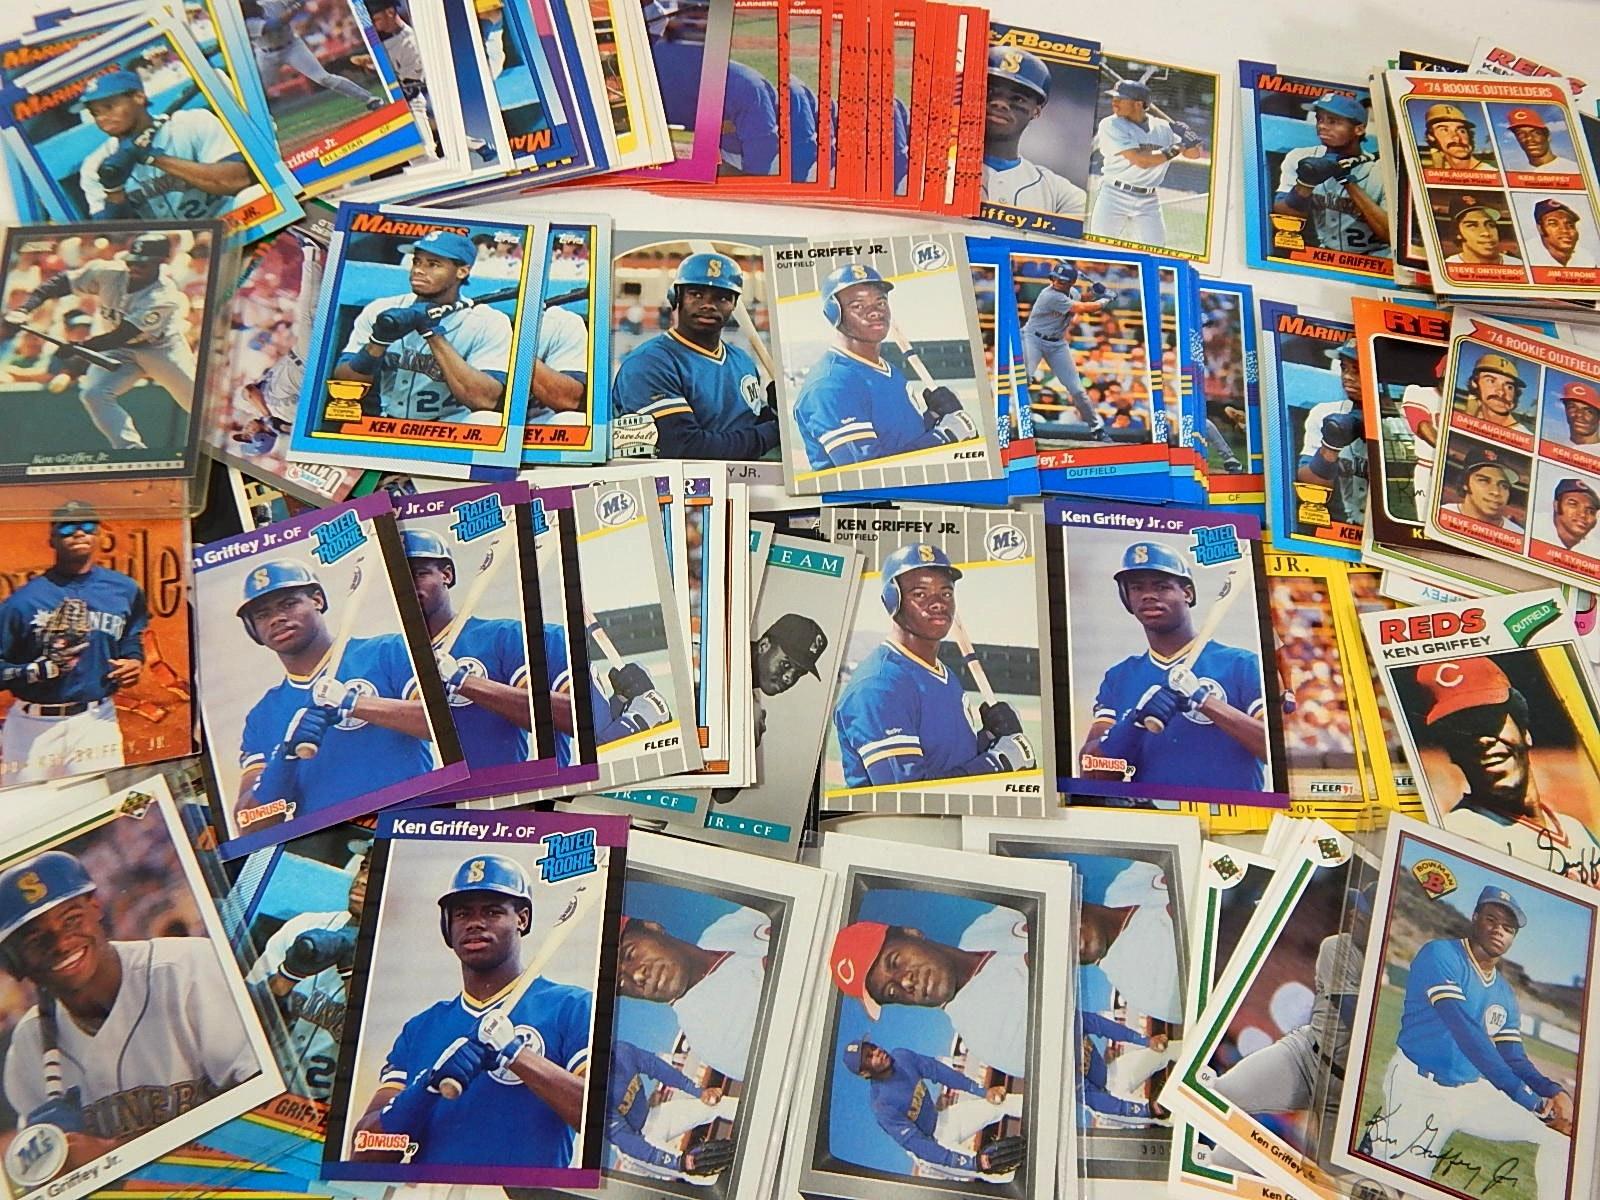 Ken Griffey Sr. and Jr. Baseball Card Collection